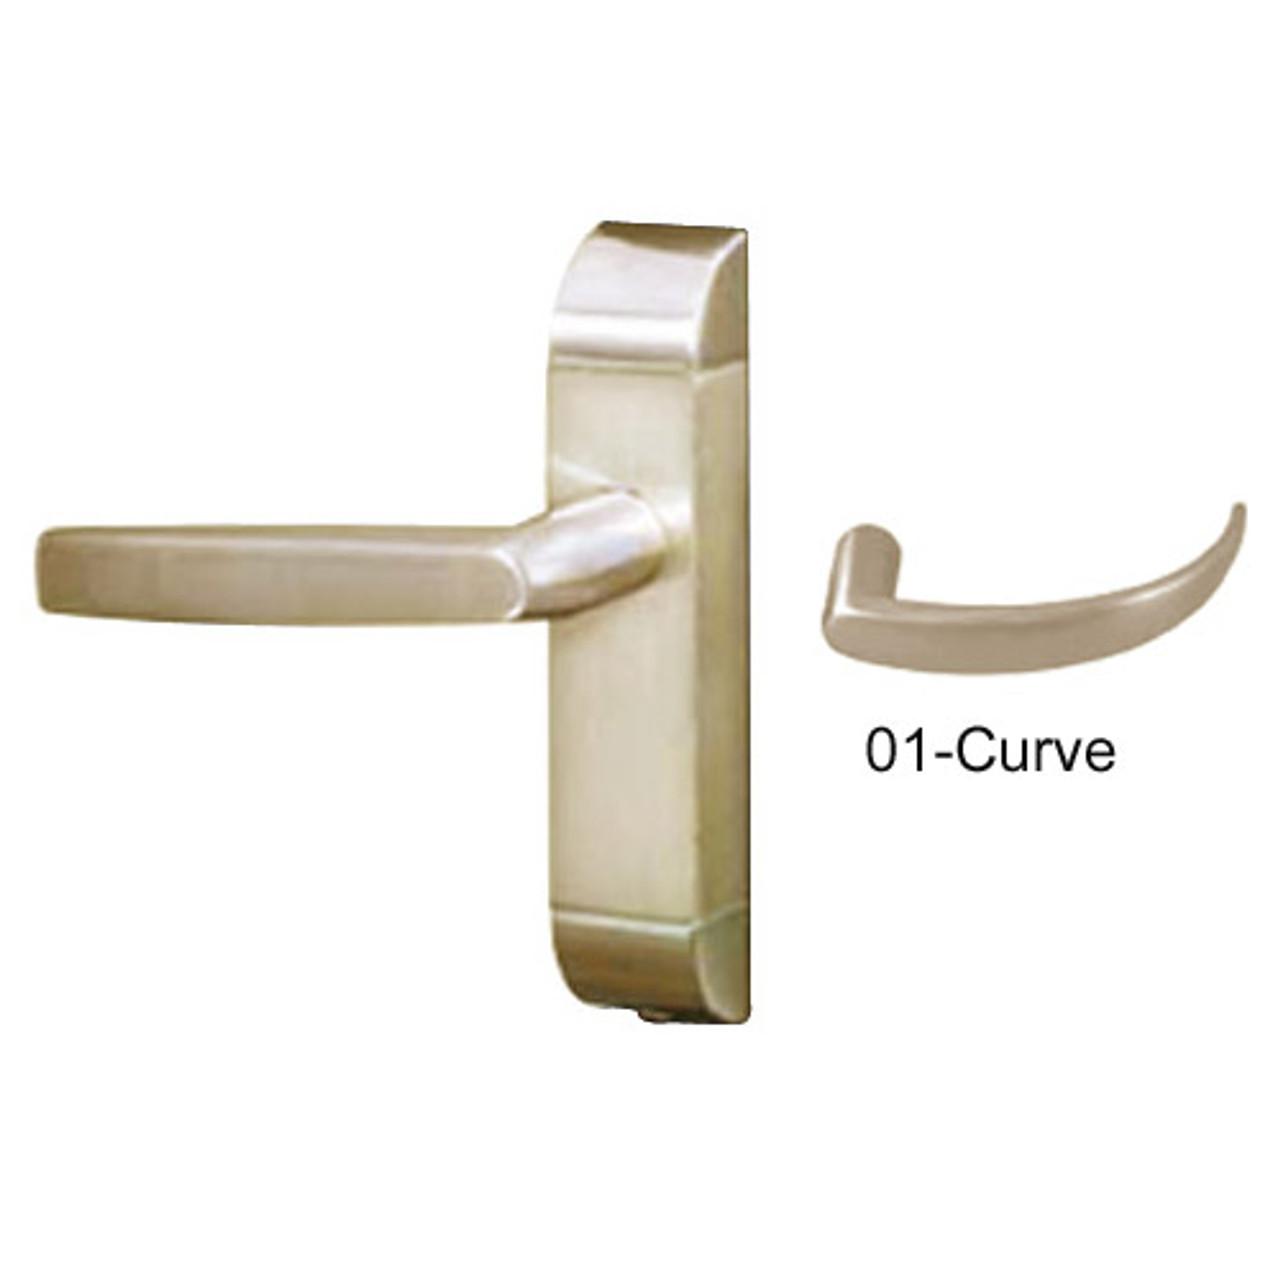 4600M-01-511-US4 Adams Rite Heavy Duty Curve Deadlatch Handles in Satin Brass Finish